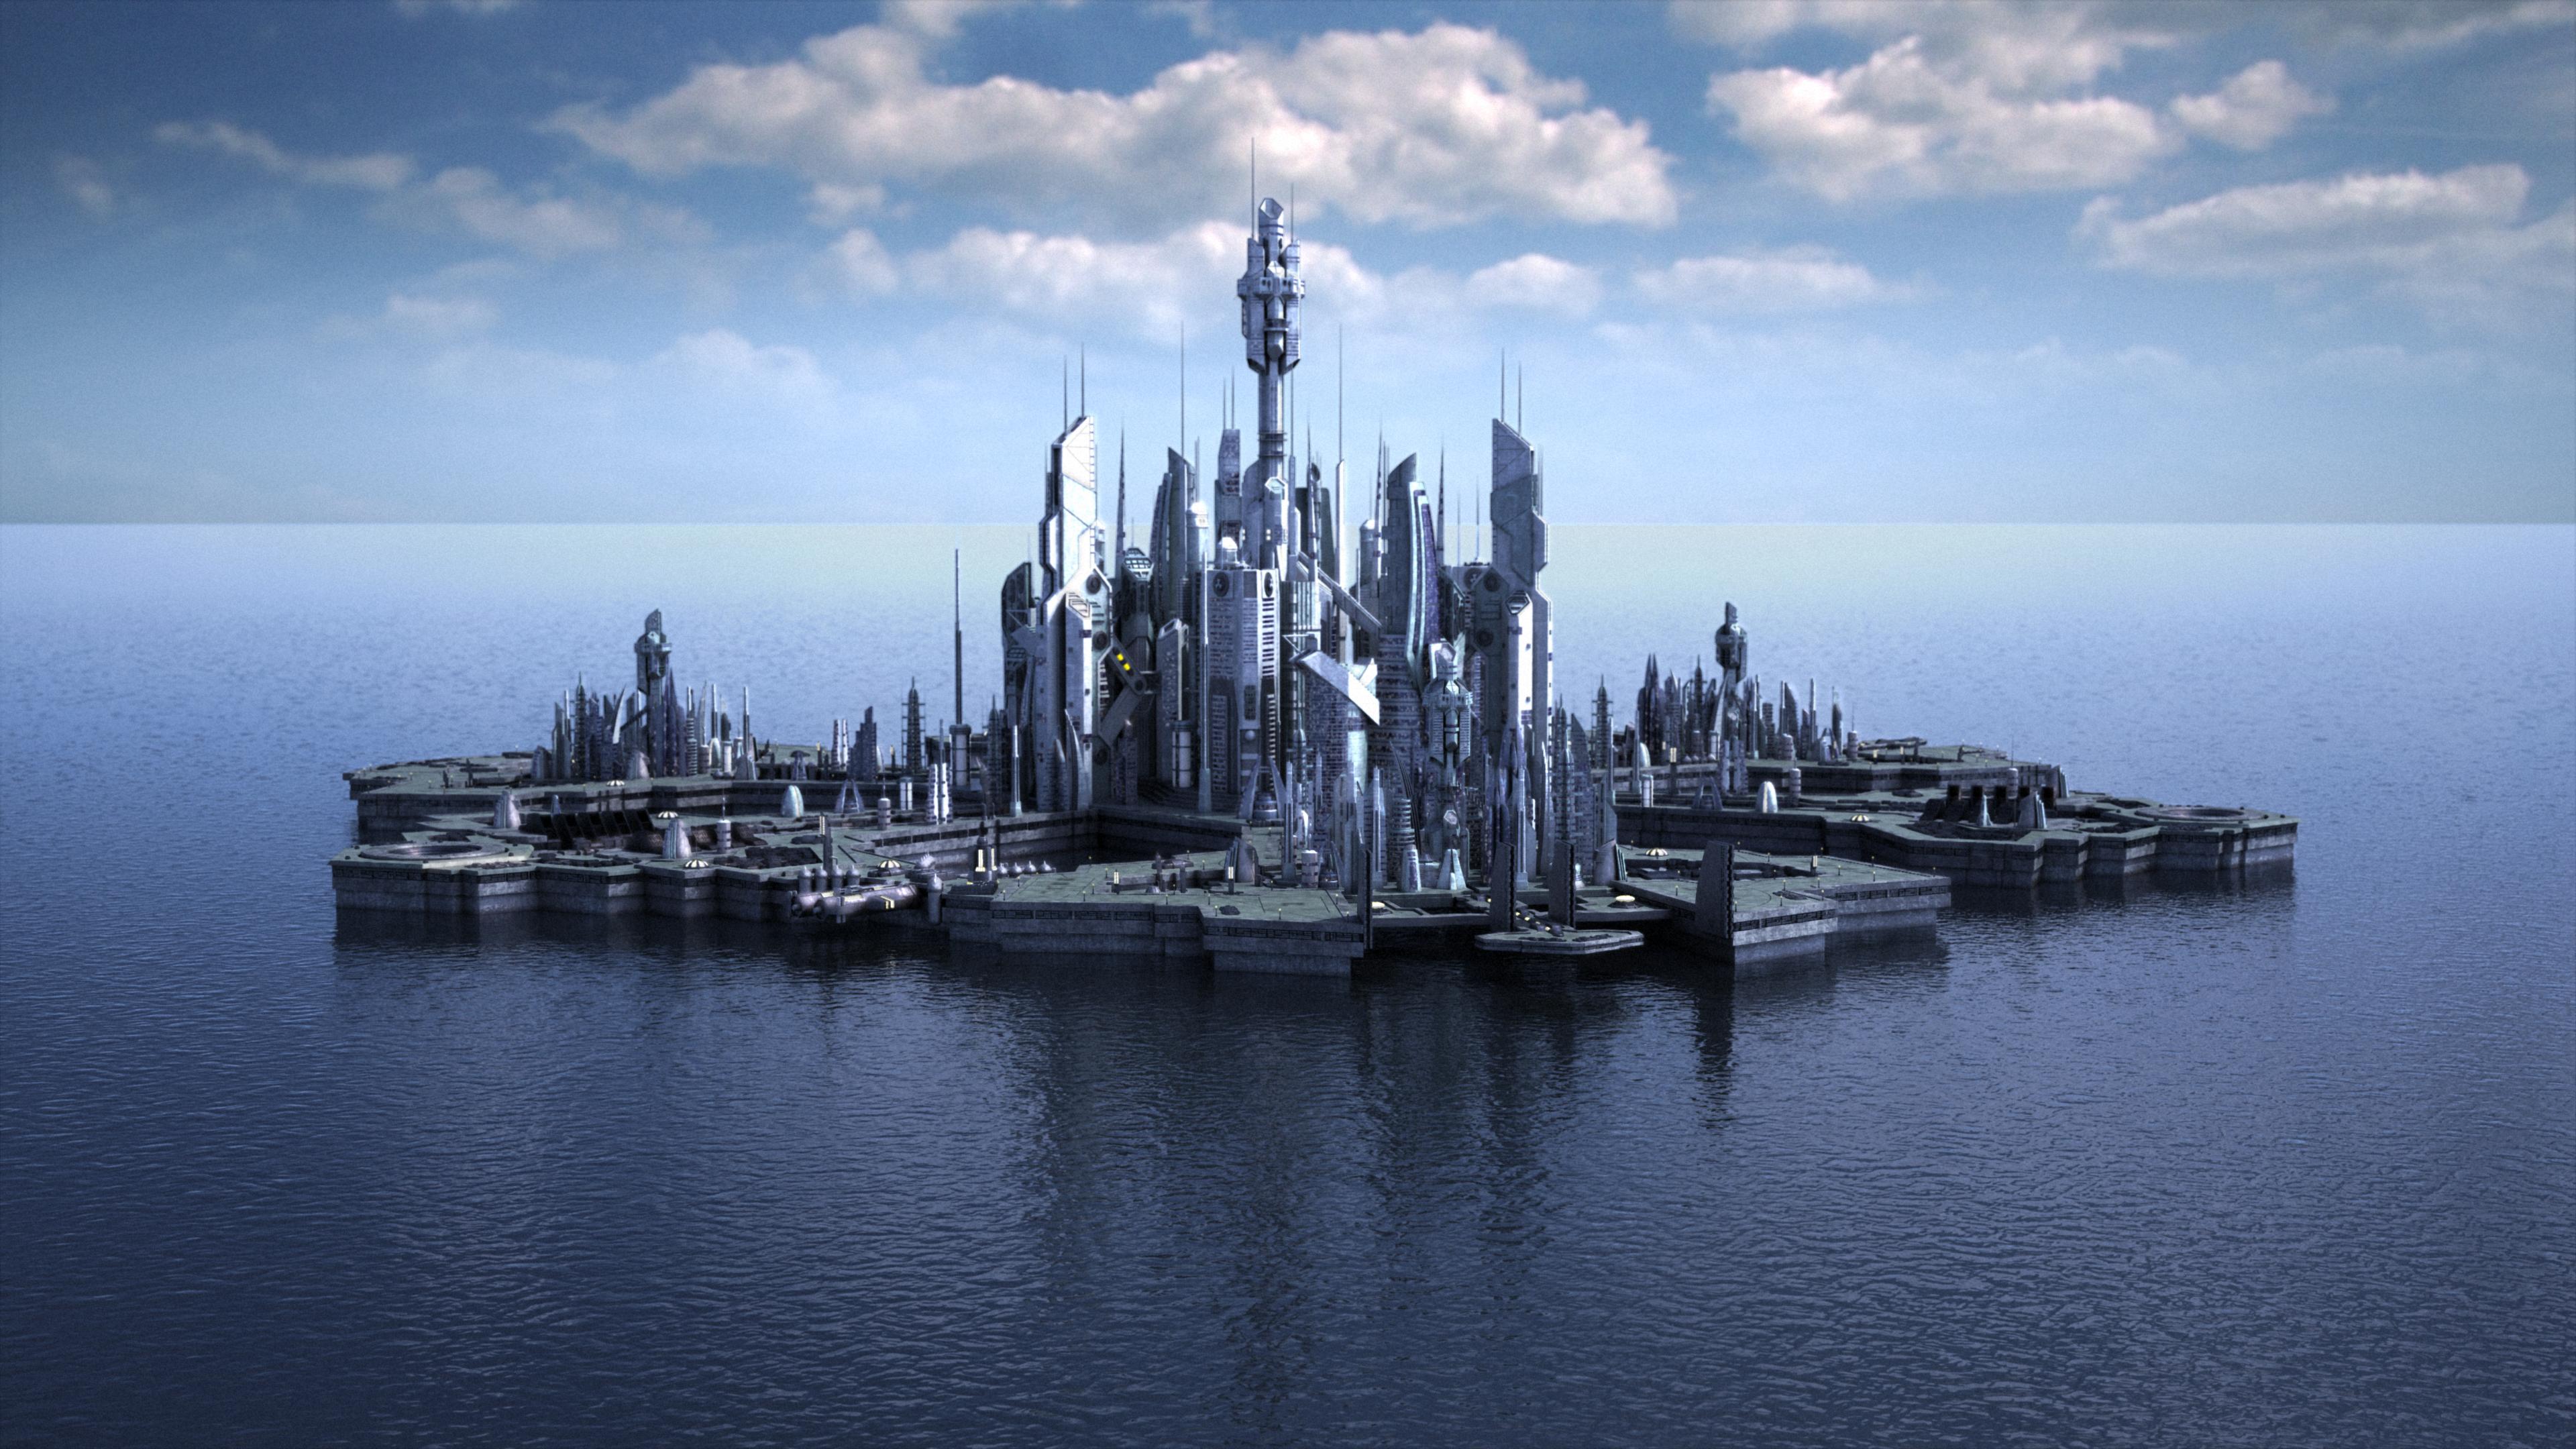 Pin Von Heather Albert Auf References City X Stargate Stargate Atlantis Atlantis